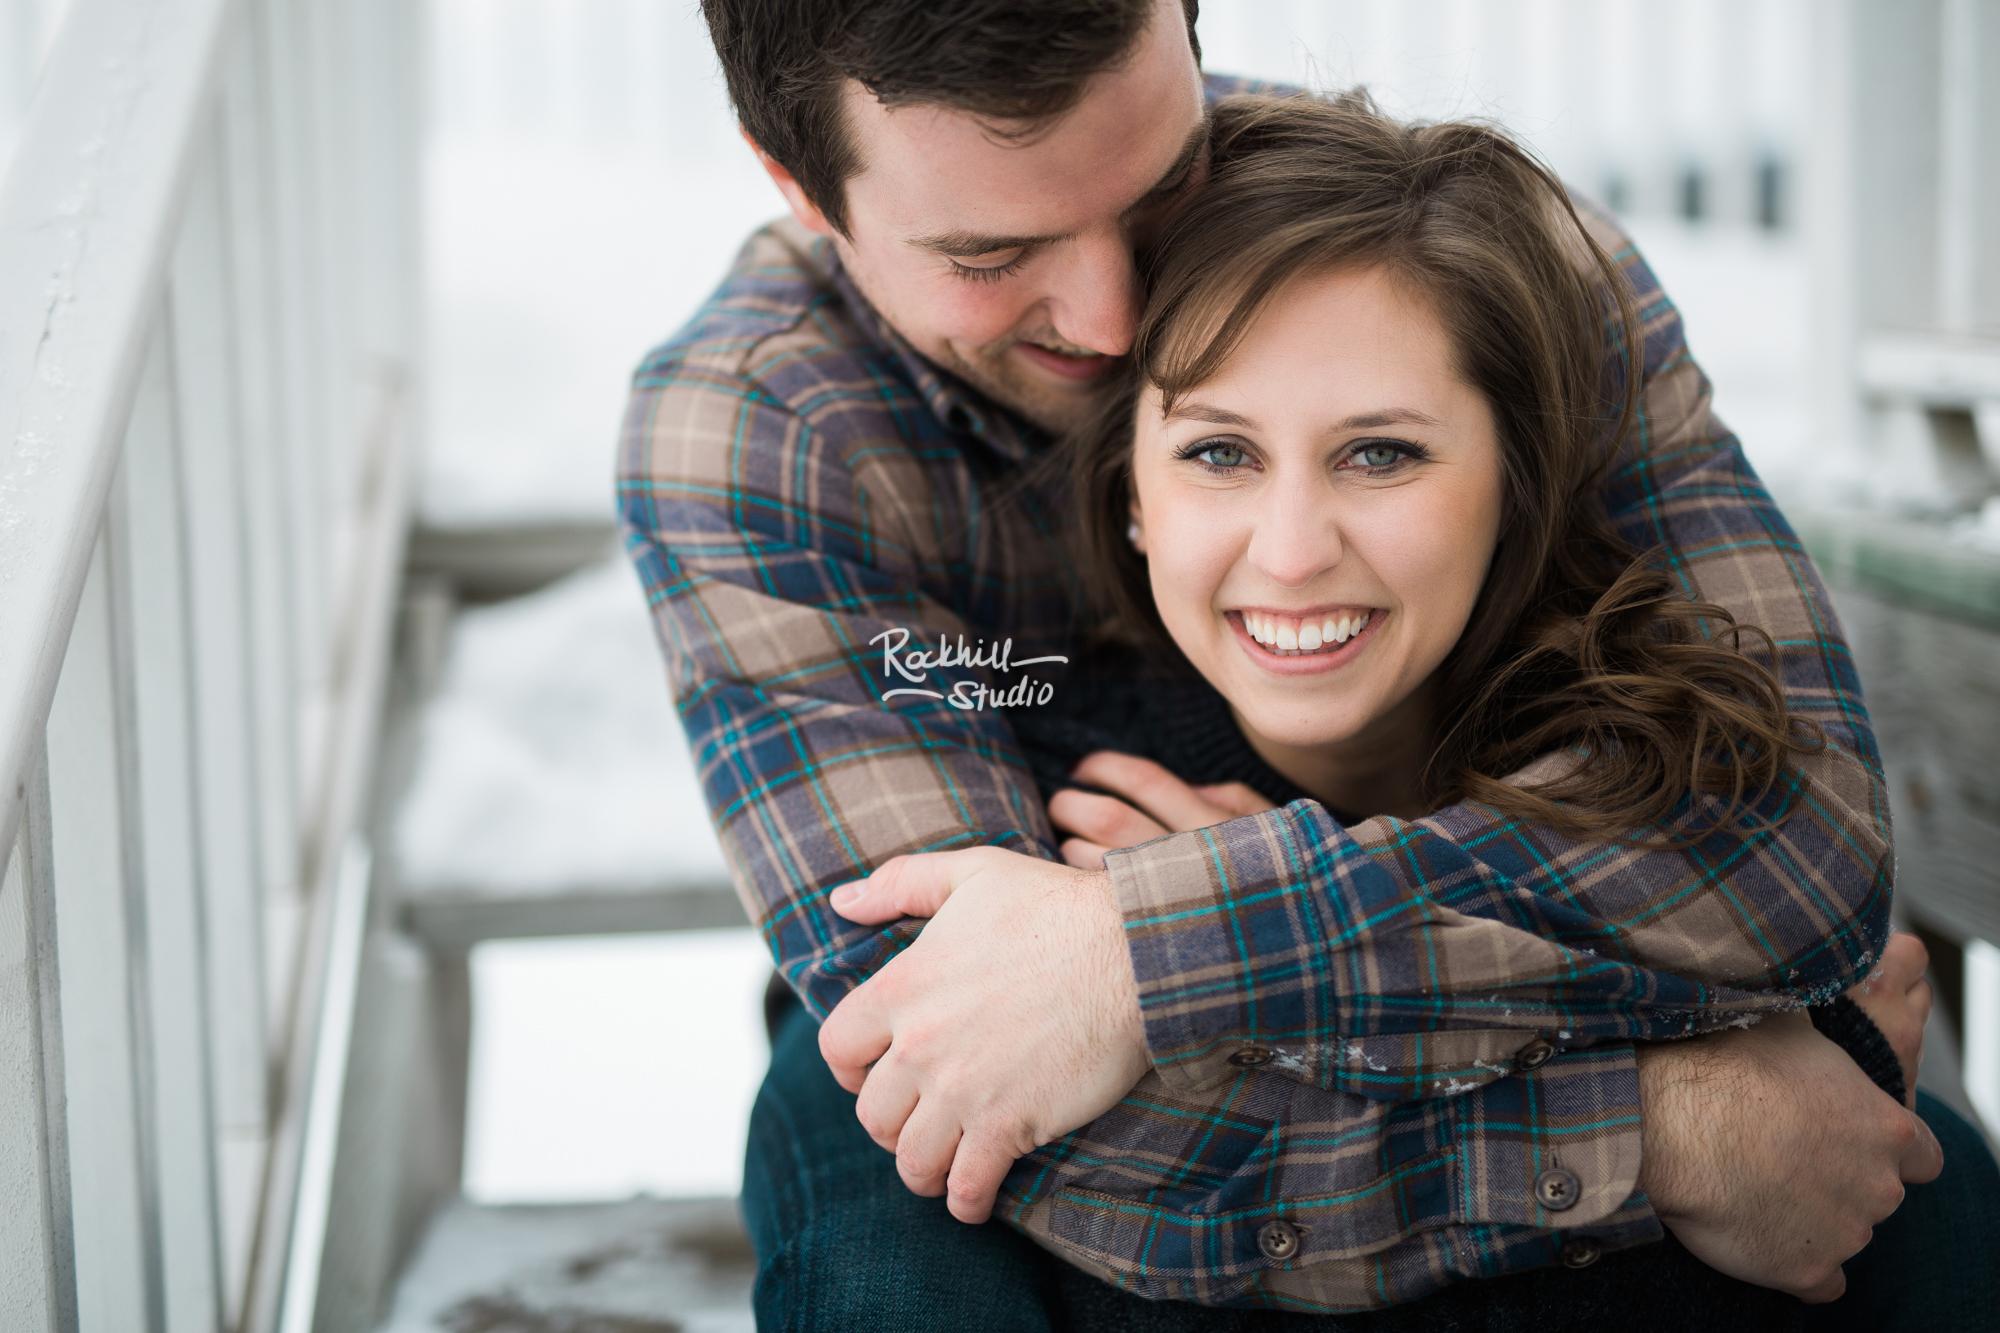 northern-michigan-upper-peninsula-engagement-photography-wedding-rockhill-studio-marquette-7.jpg